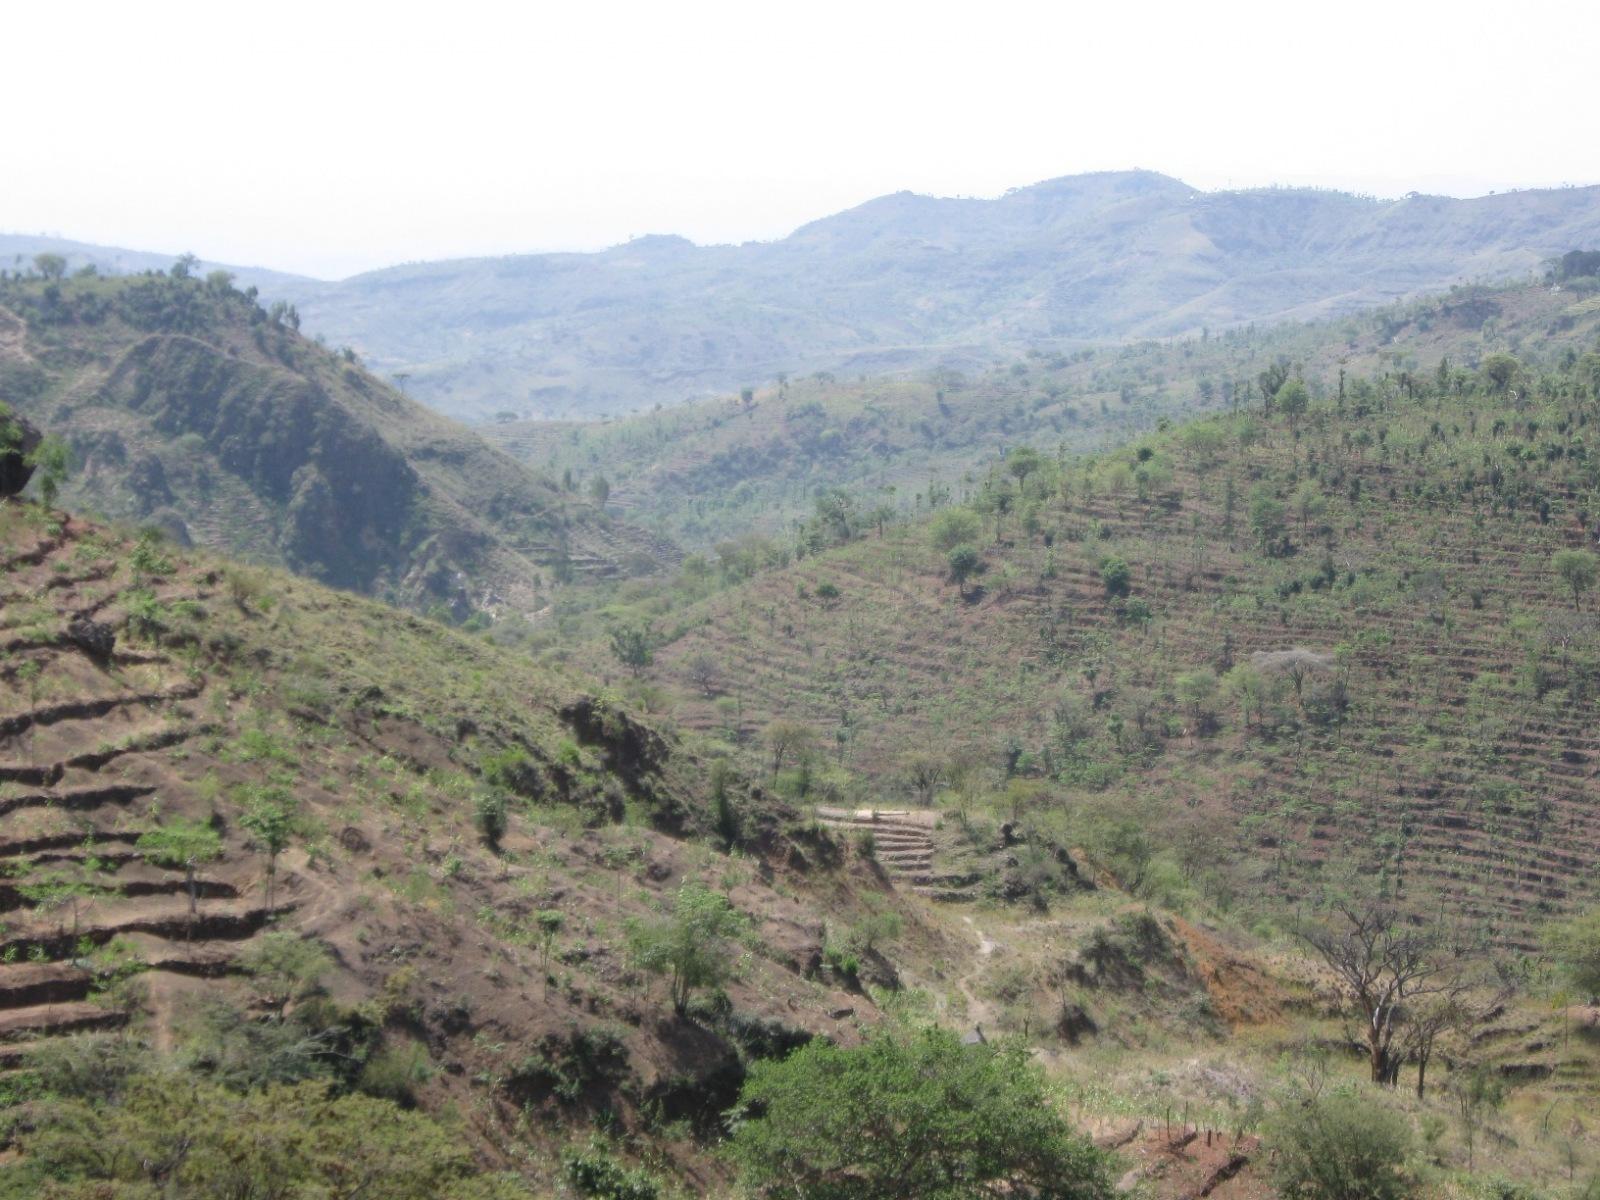 Krajina Konso, Etiopie  (autor: Trees for the Future)